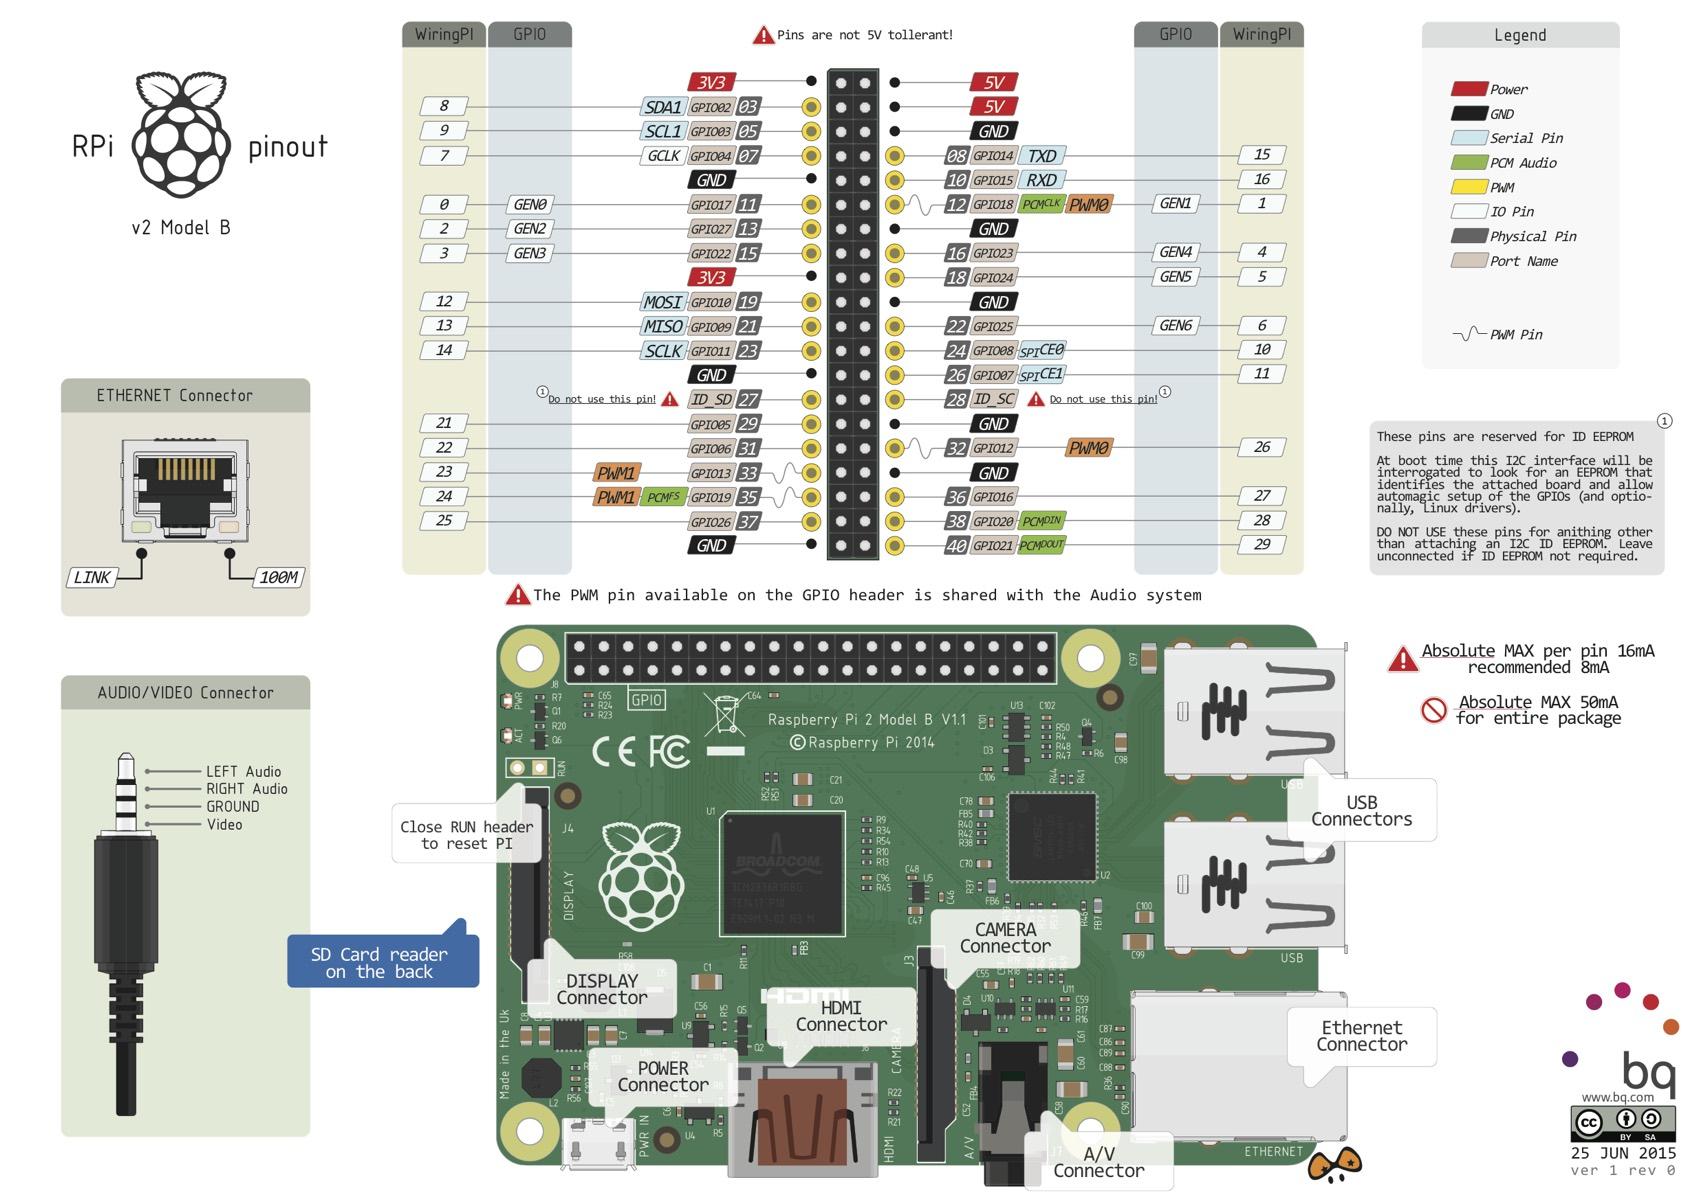 raspberry pi 3 model b wiring diagram 2004 bmw x5 headlight v2 mod pinout raspberrypi